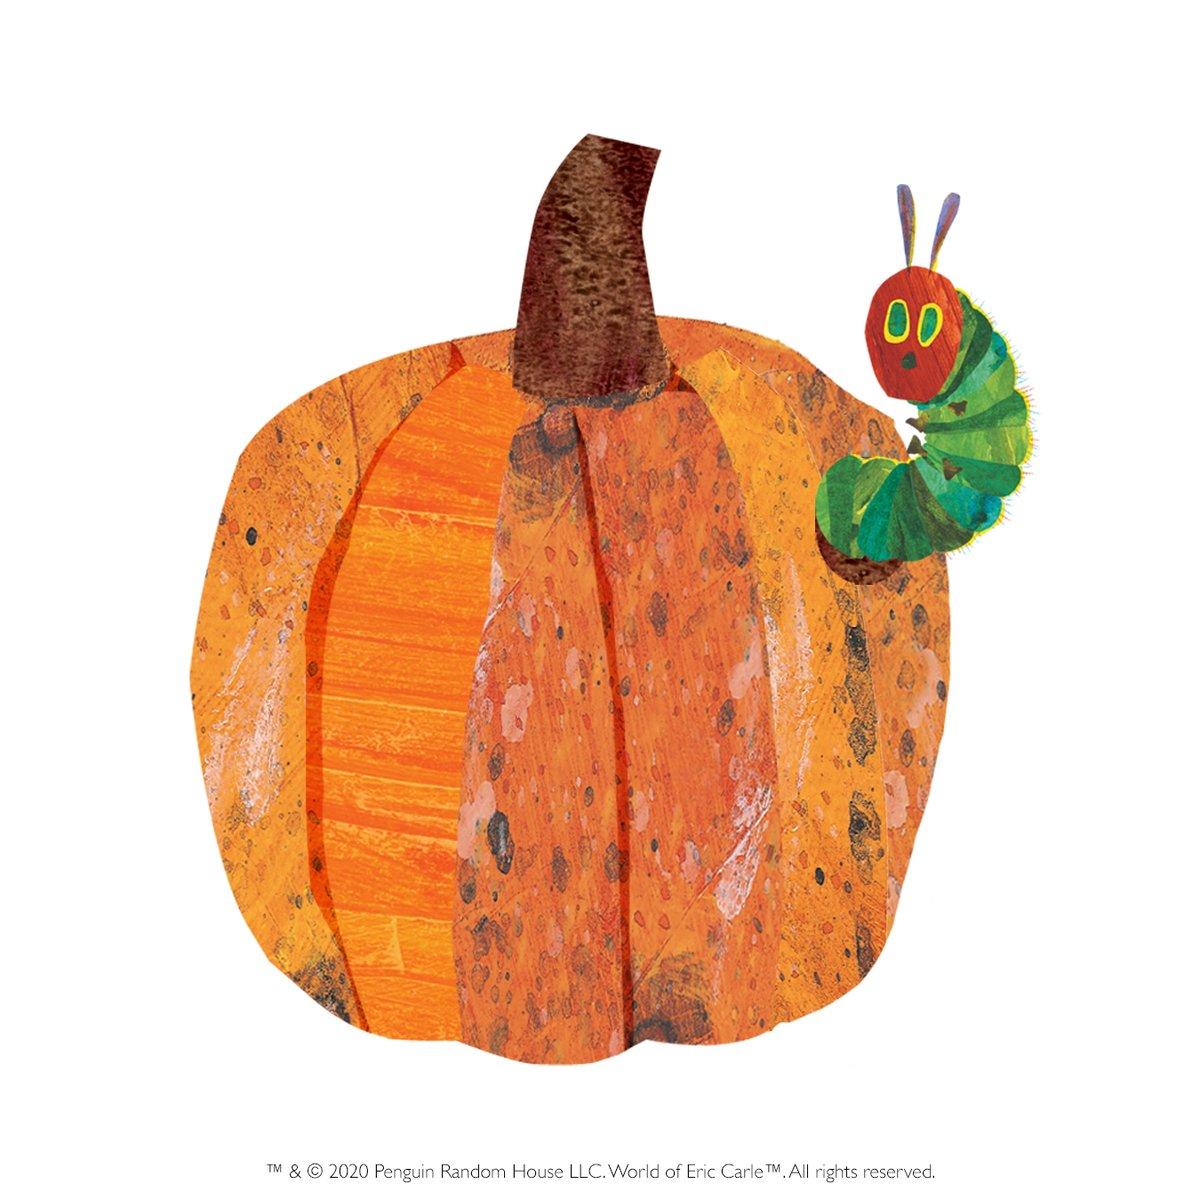 A Pumpkin for Fall!